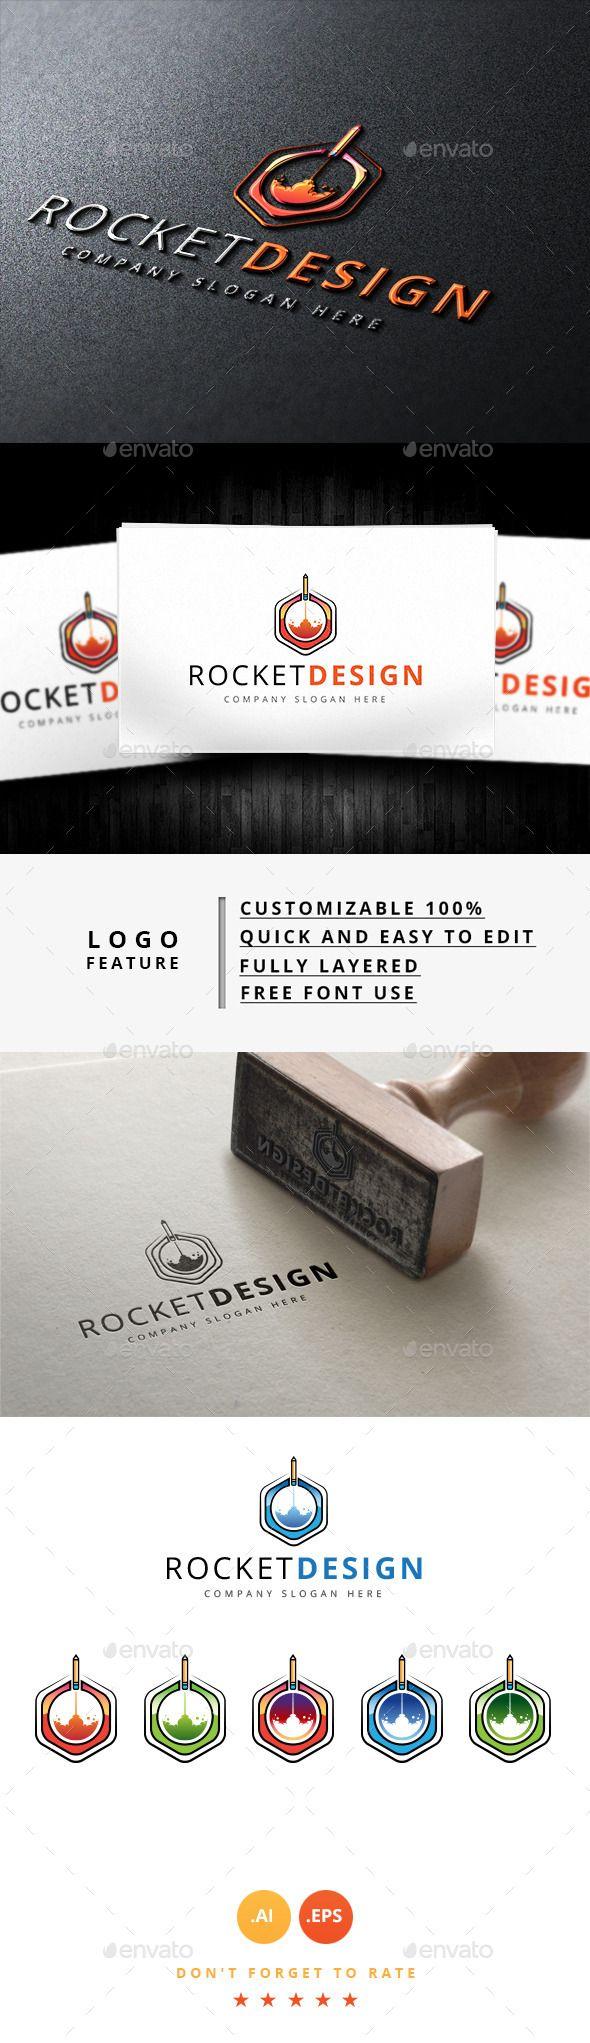 Rocket Design Logo — Vector EPS #brand logo #photo logo • Available here → https://graphicriver.net/item/rocket-design-logo/8956783?ref=pxcr